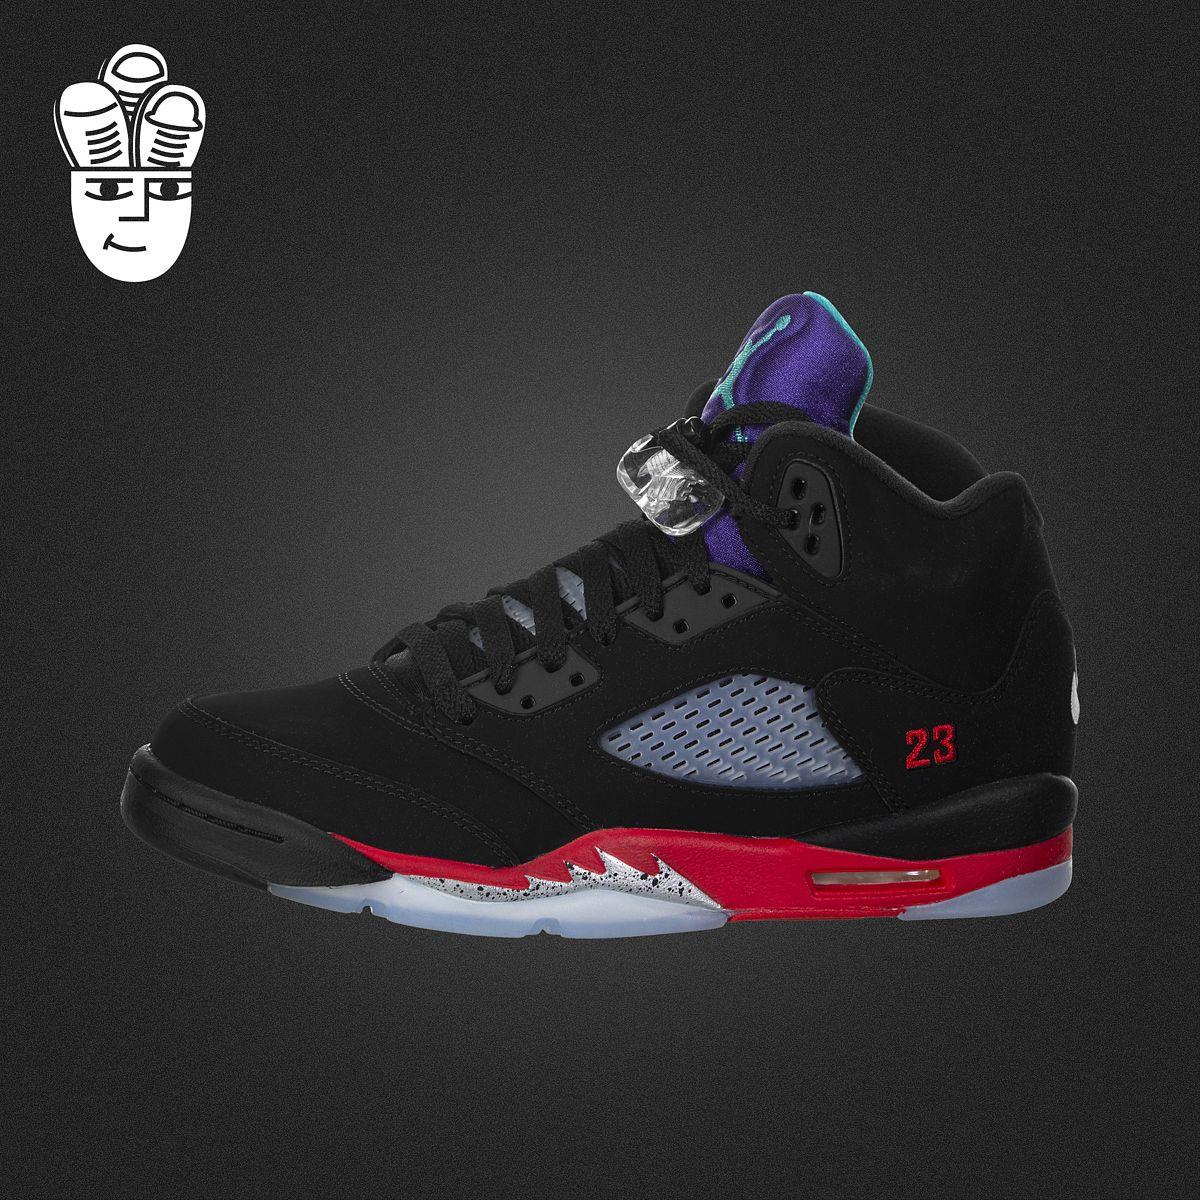 Air Jordan V (5) Retro AJ5男鞋女鞋 GS篮球鞋 运动休闲鞋